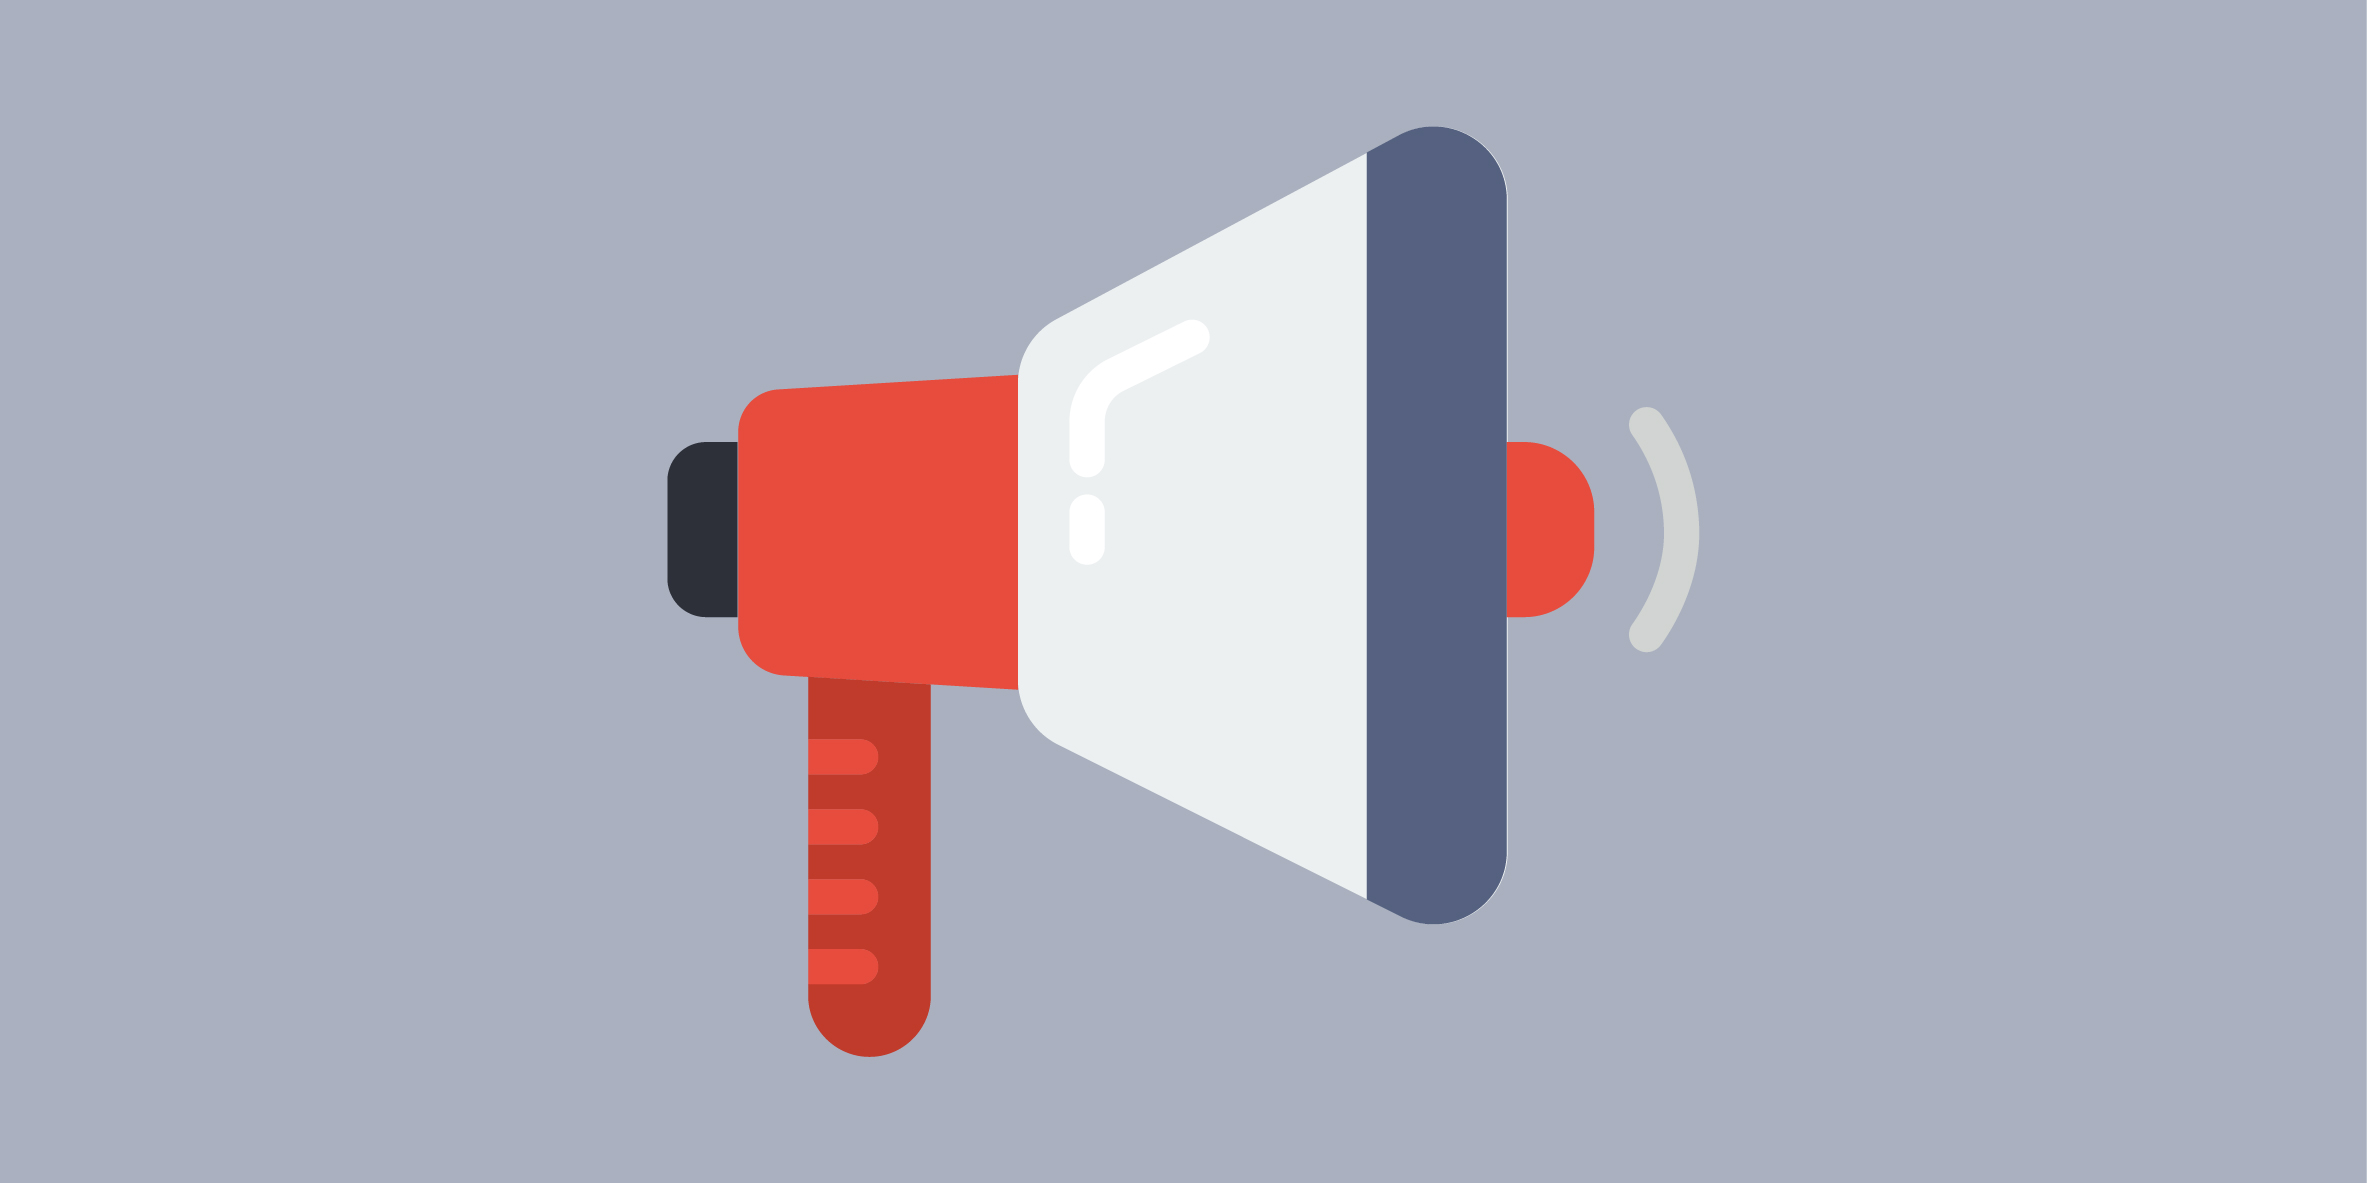 Lo último en marketing: el 'storytelling' | Sala de prensa Grupo Asesor ADADE y E-Consulting Global Group